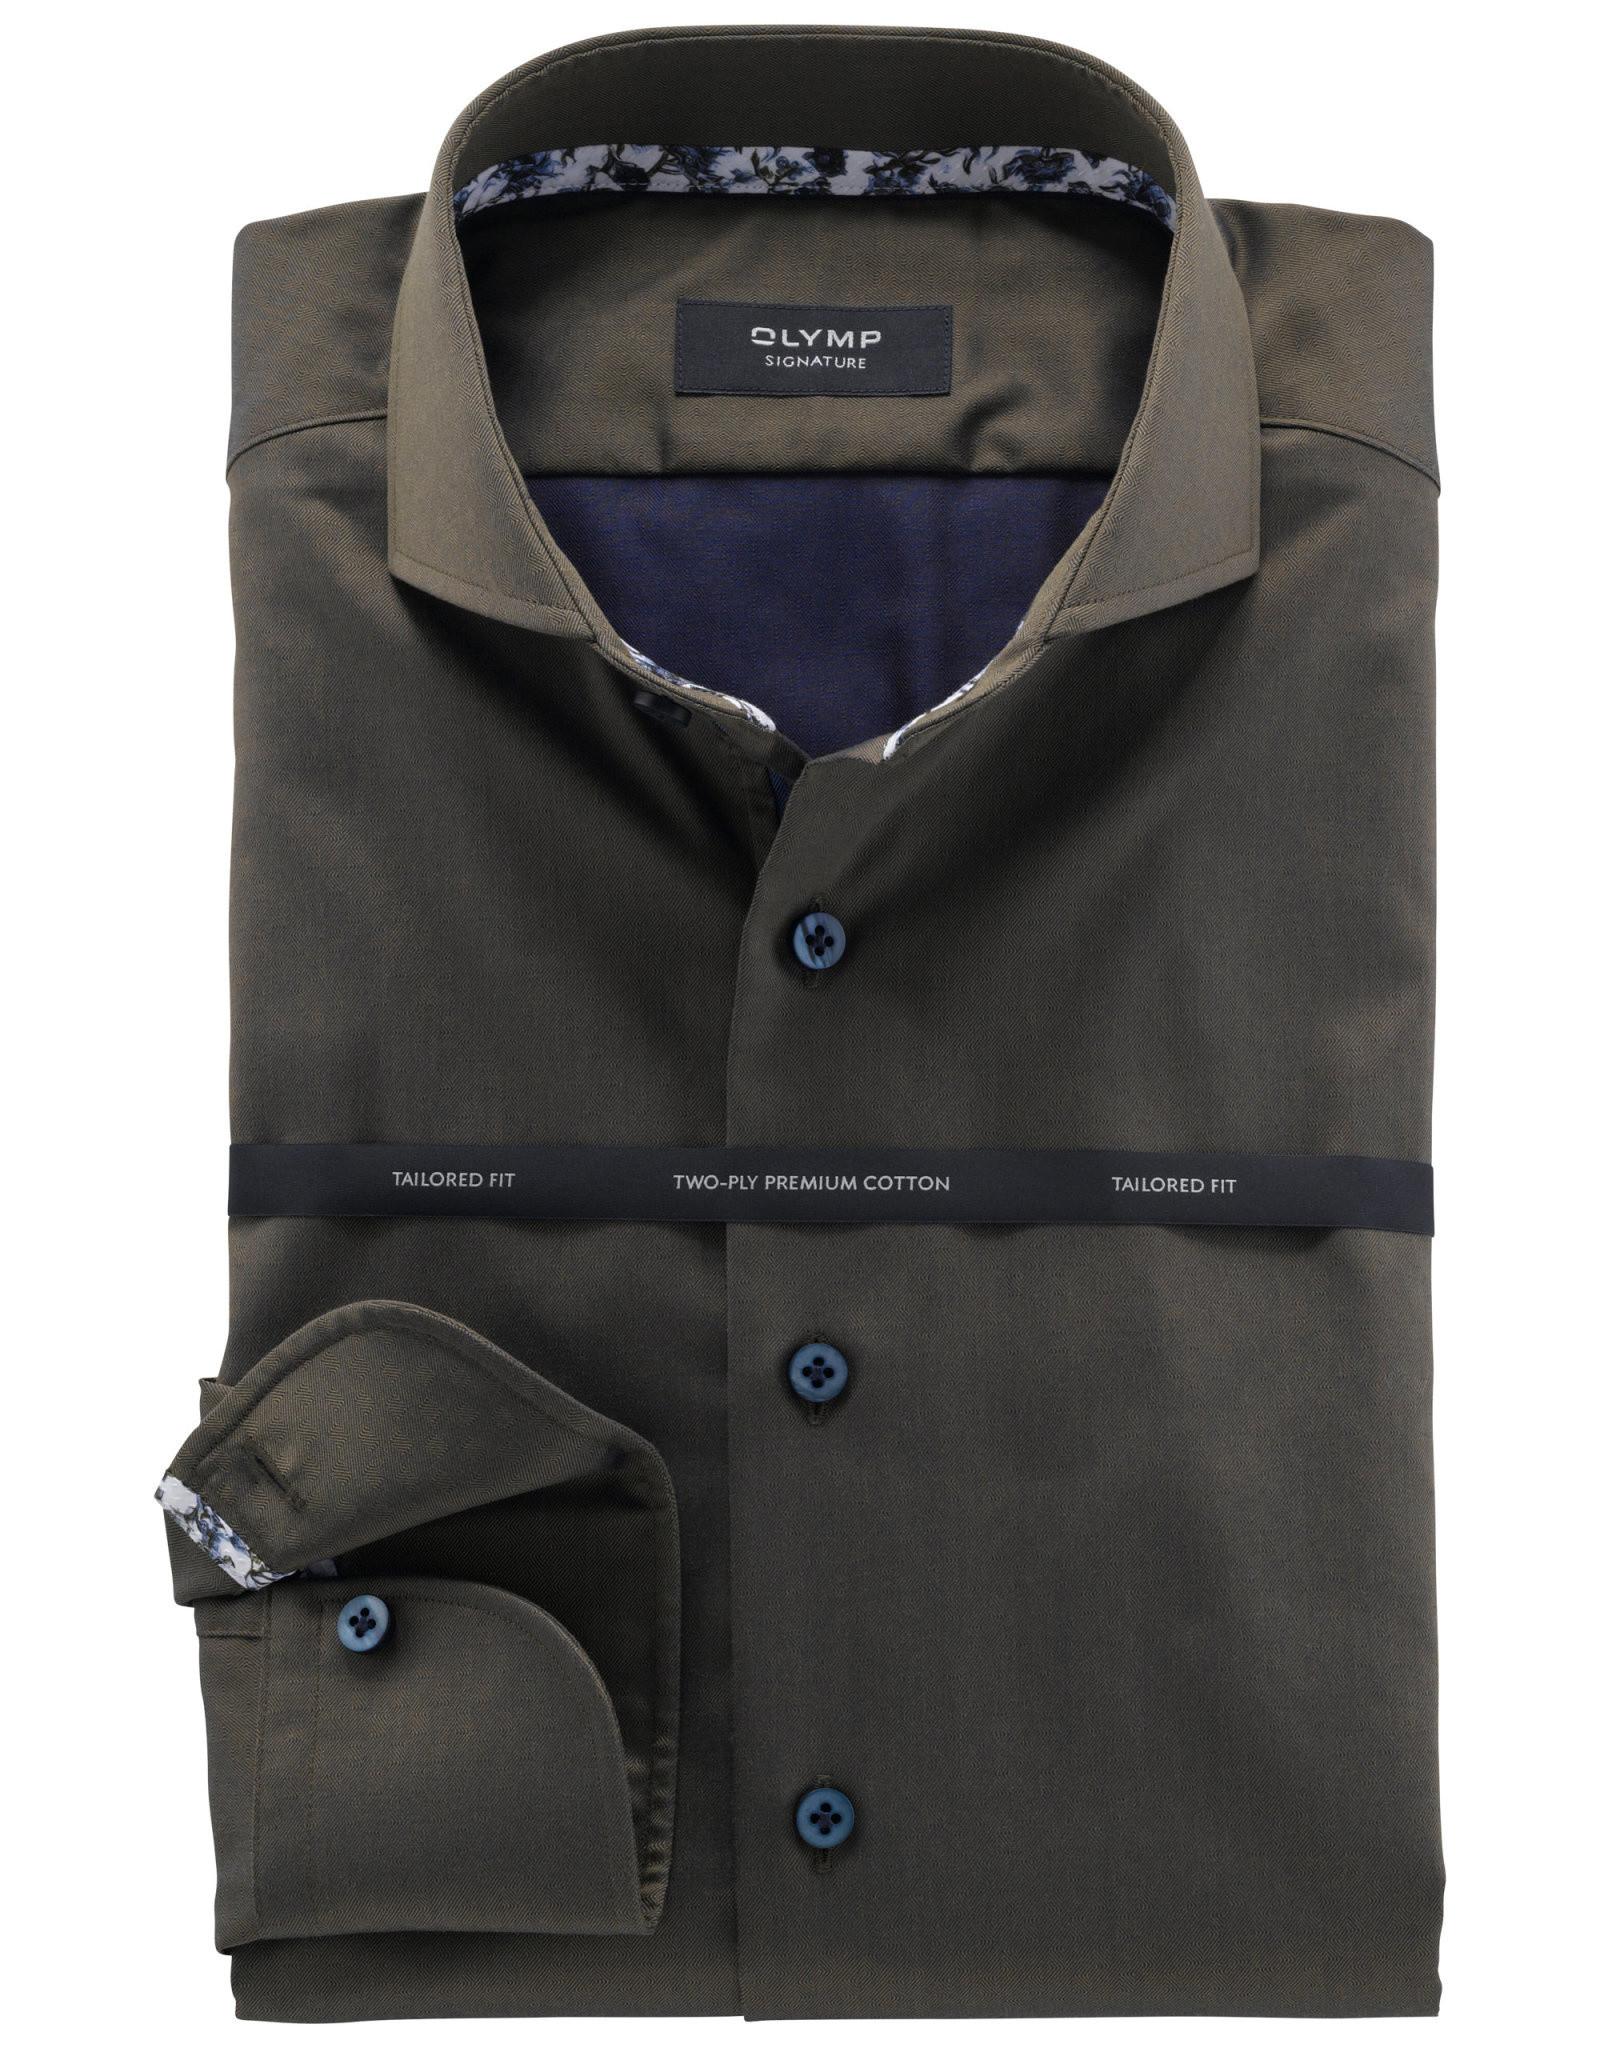 Olymp Signature tailored fit overhemd groen dessin